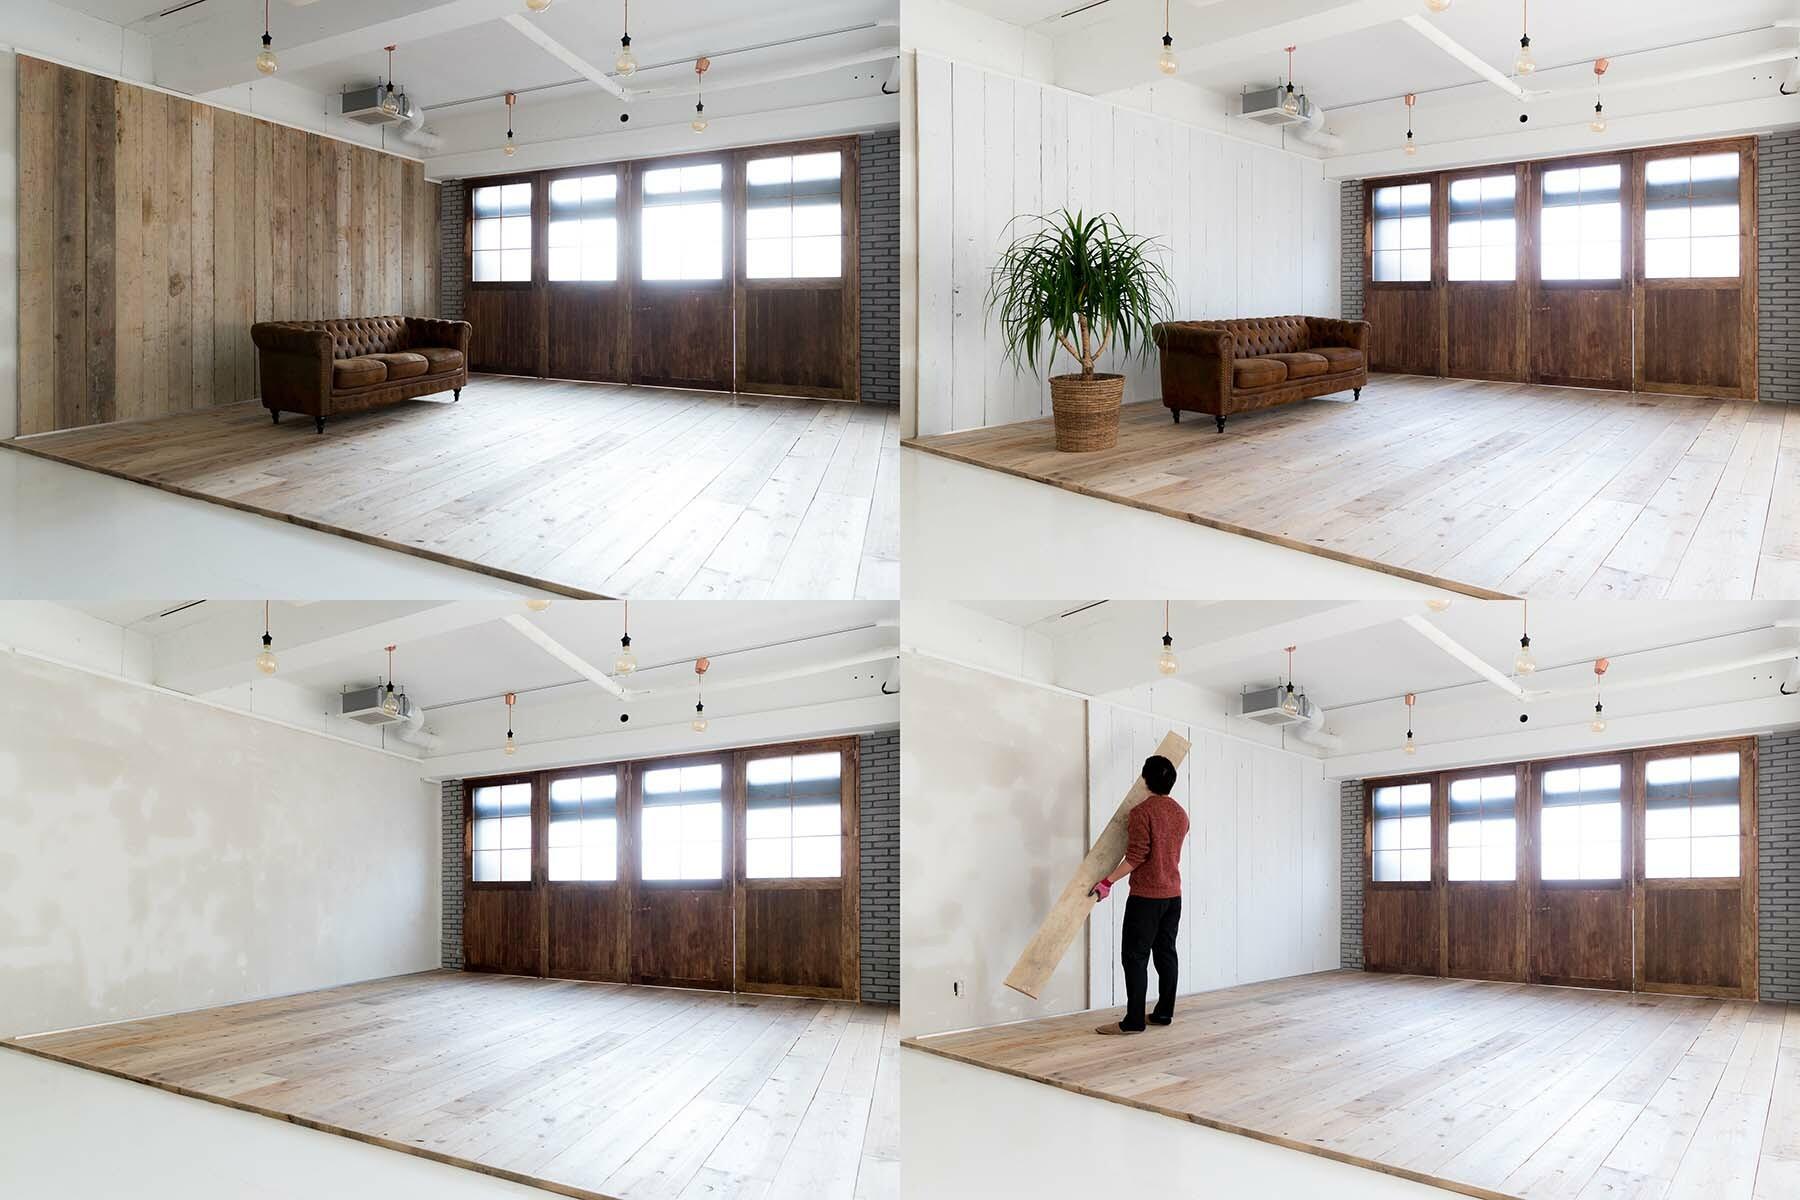 Studio Serato 笹塚 (スタジオセラート笹塚)入替可能な壁パネル(ホワイト)